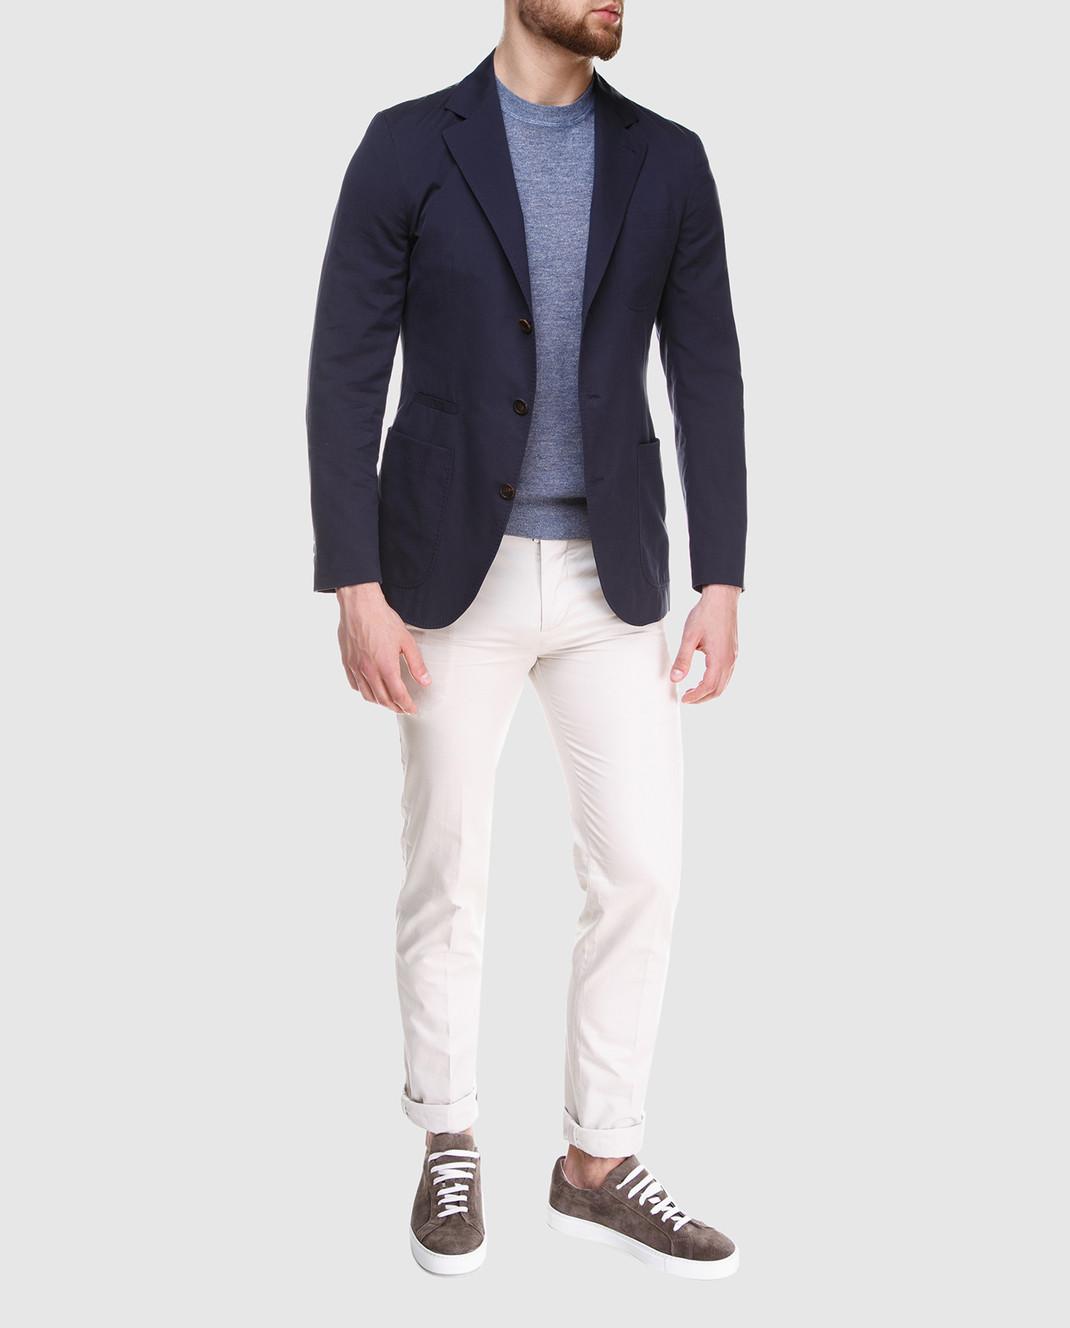 Brunello Cucinelli Темно-синий пиджак MD4007BND изображение 2